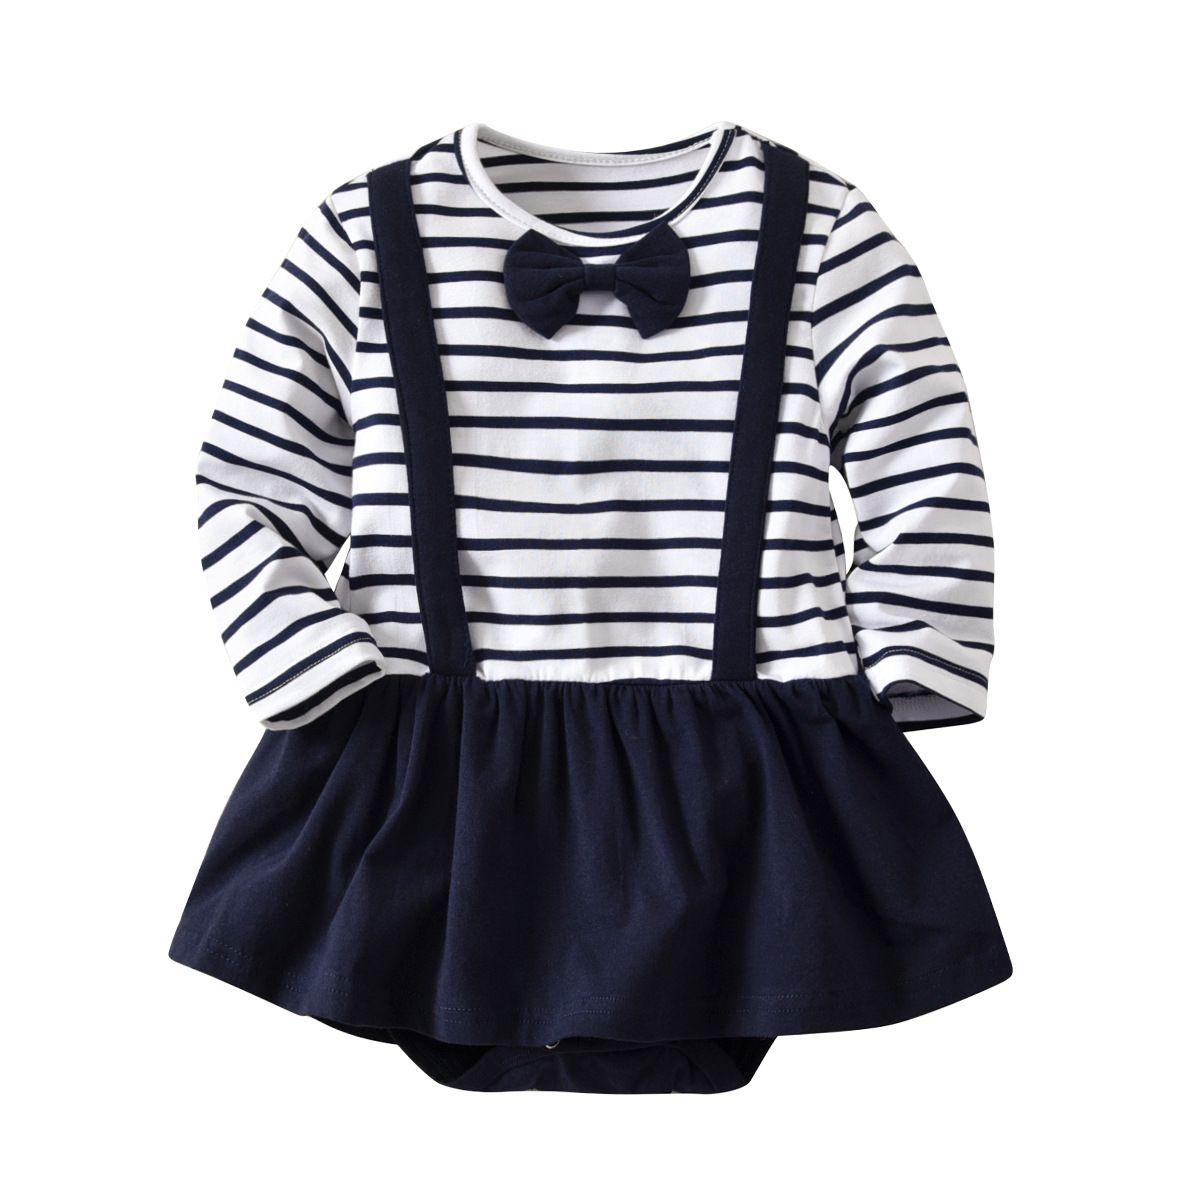 7e360e688 2019 Amazon Baby Suit